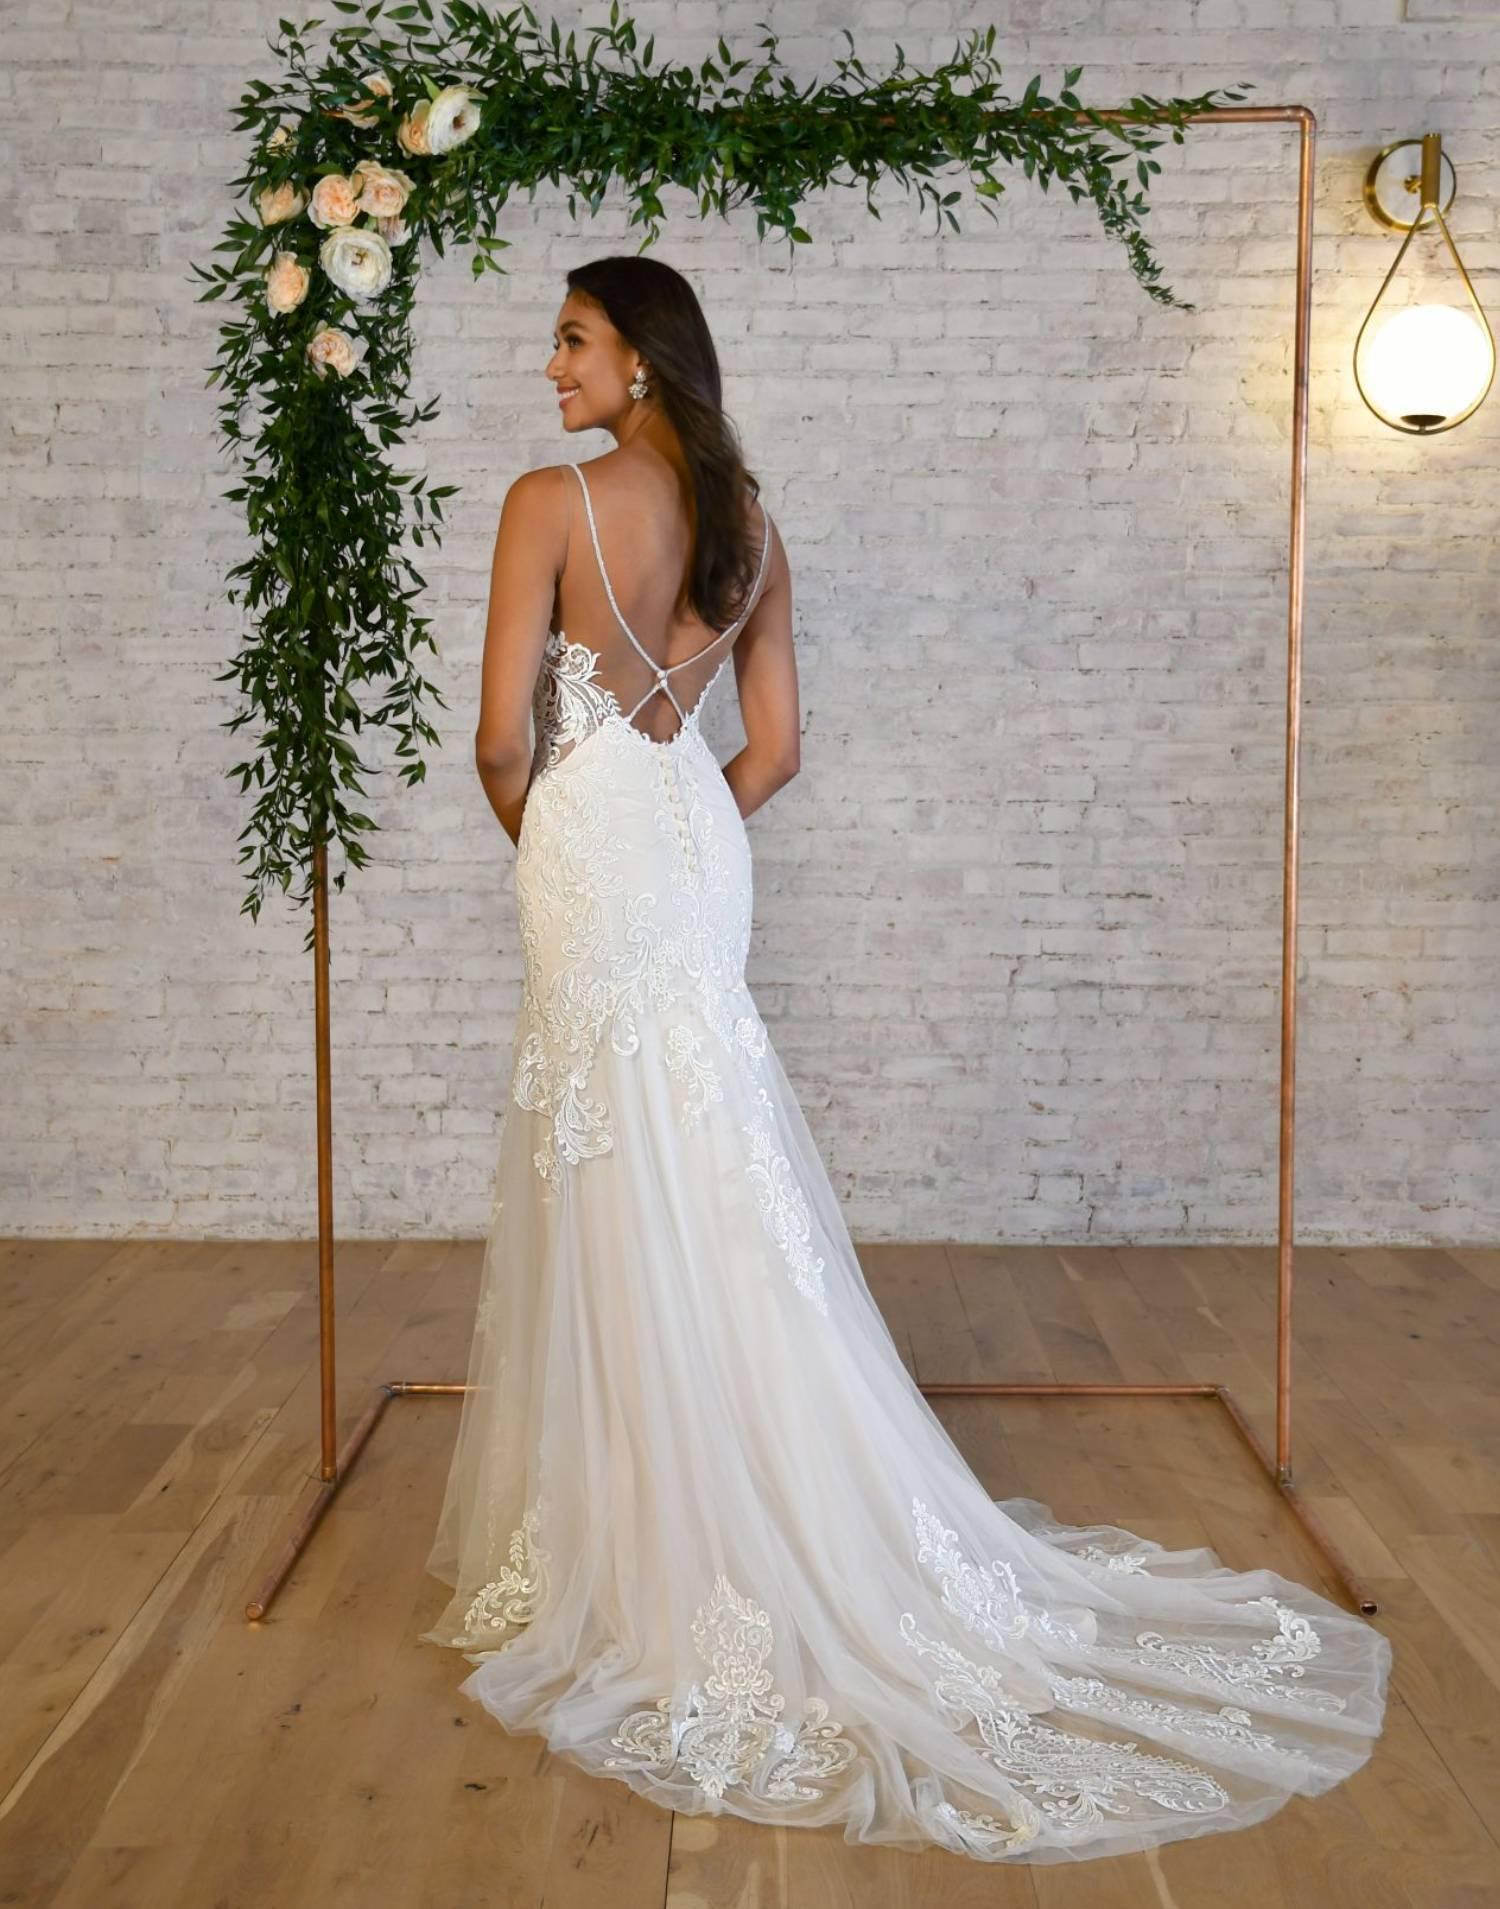 7325-wedding-dress-Stella-York-front-view-min